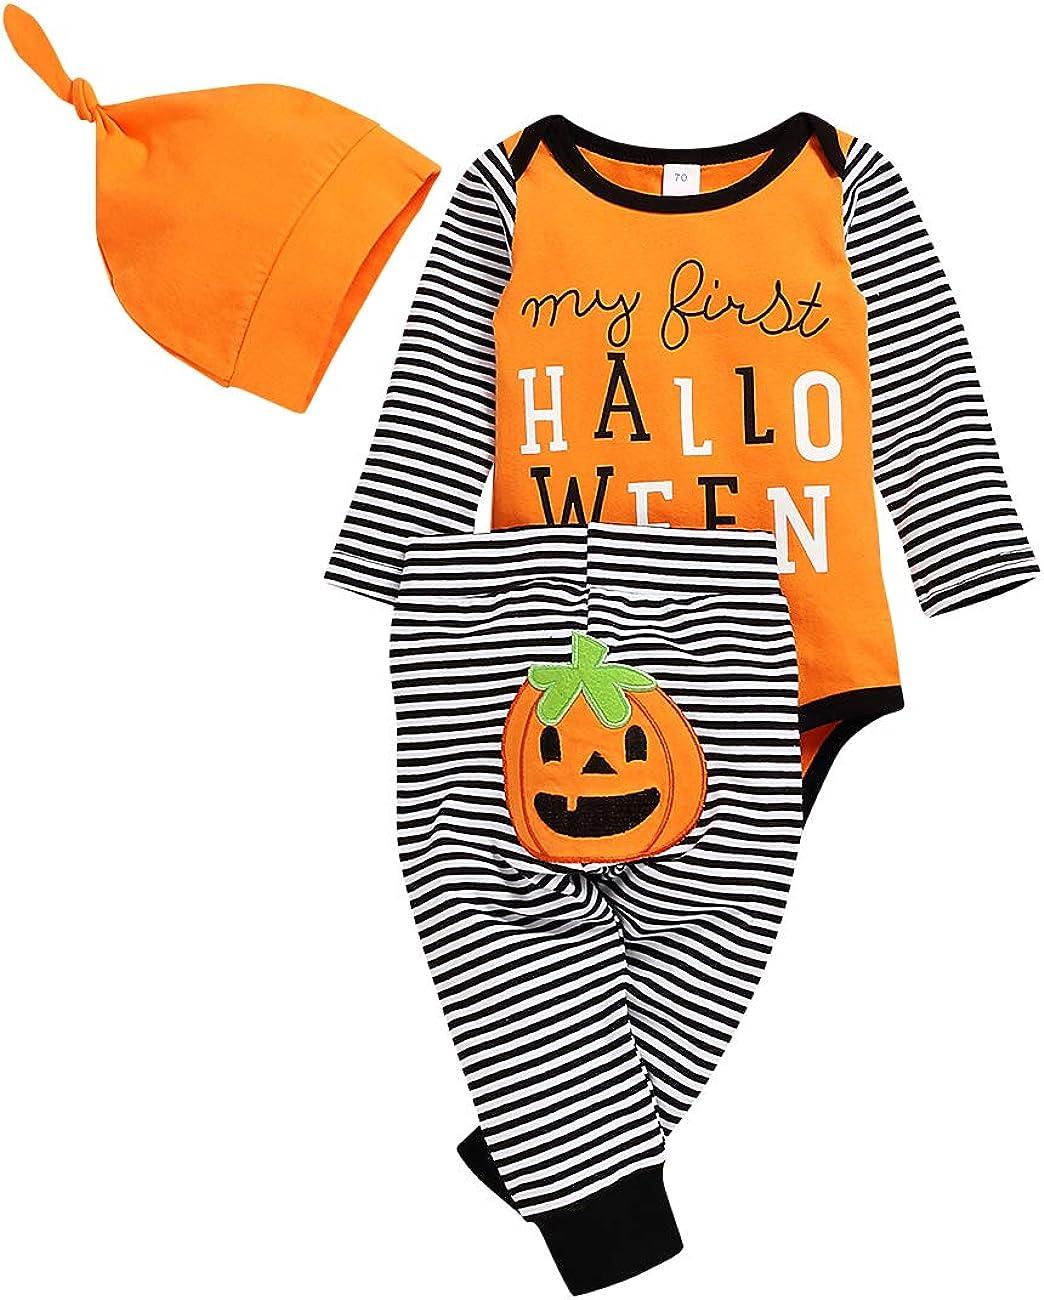 Ghost Baby Grow Costume Childrens Halloween Babies Newborn Fancy Dress Outfit